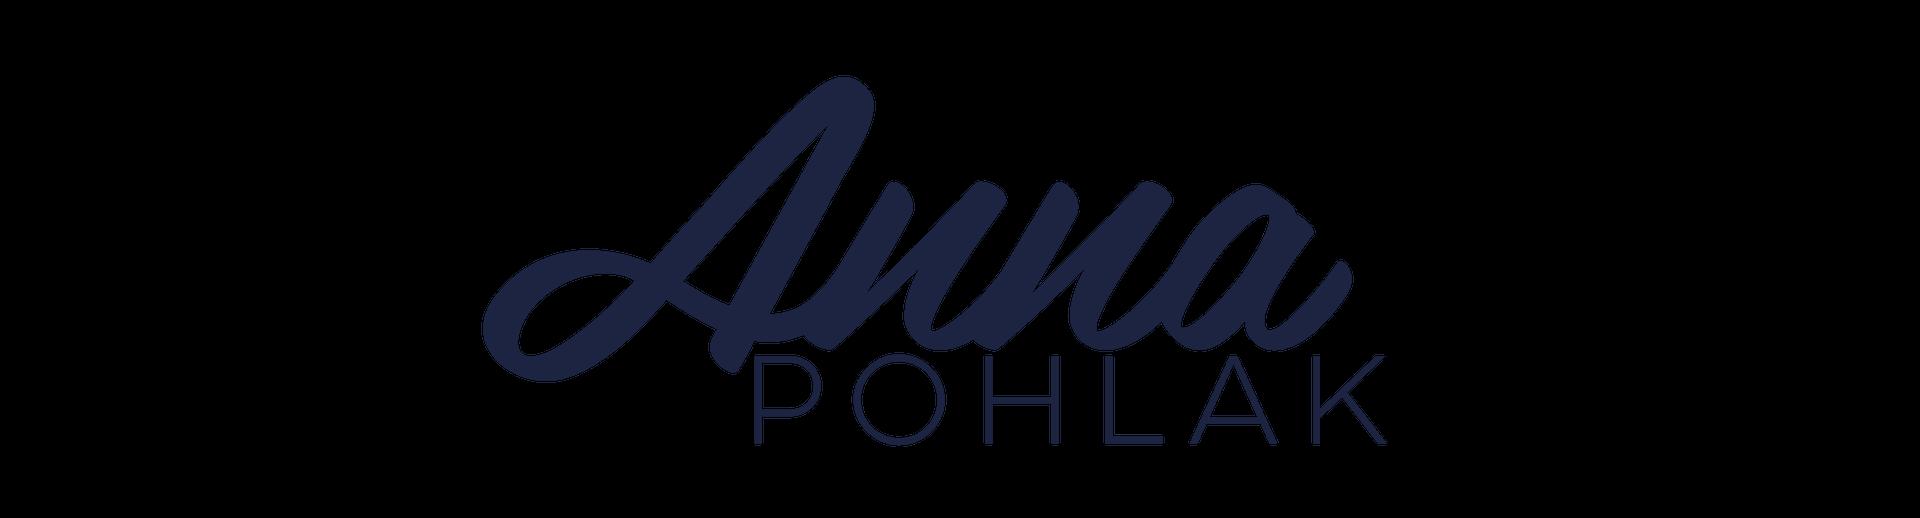 Anna Pohlak